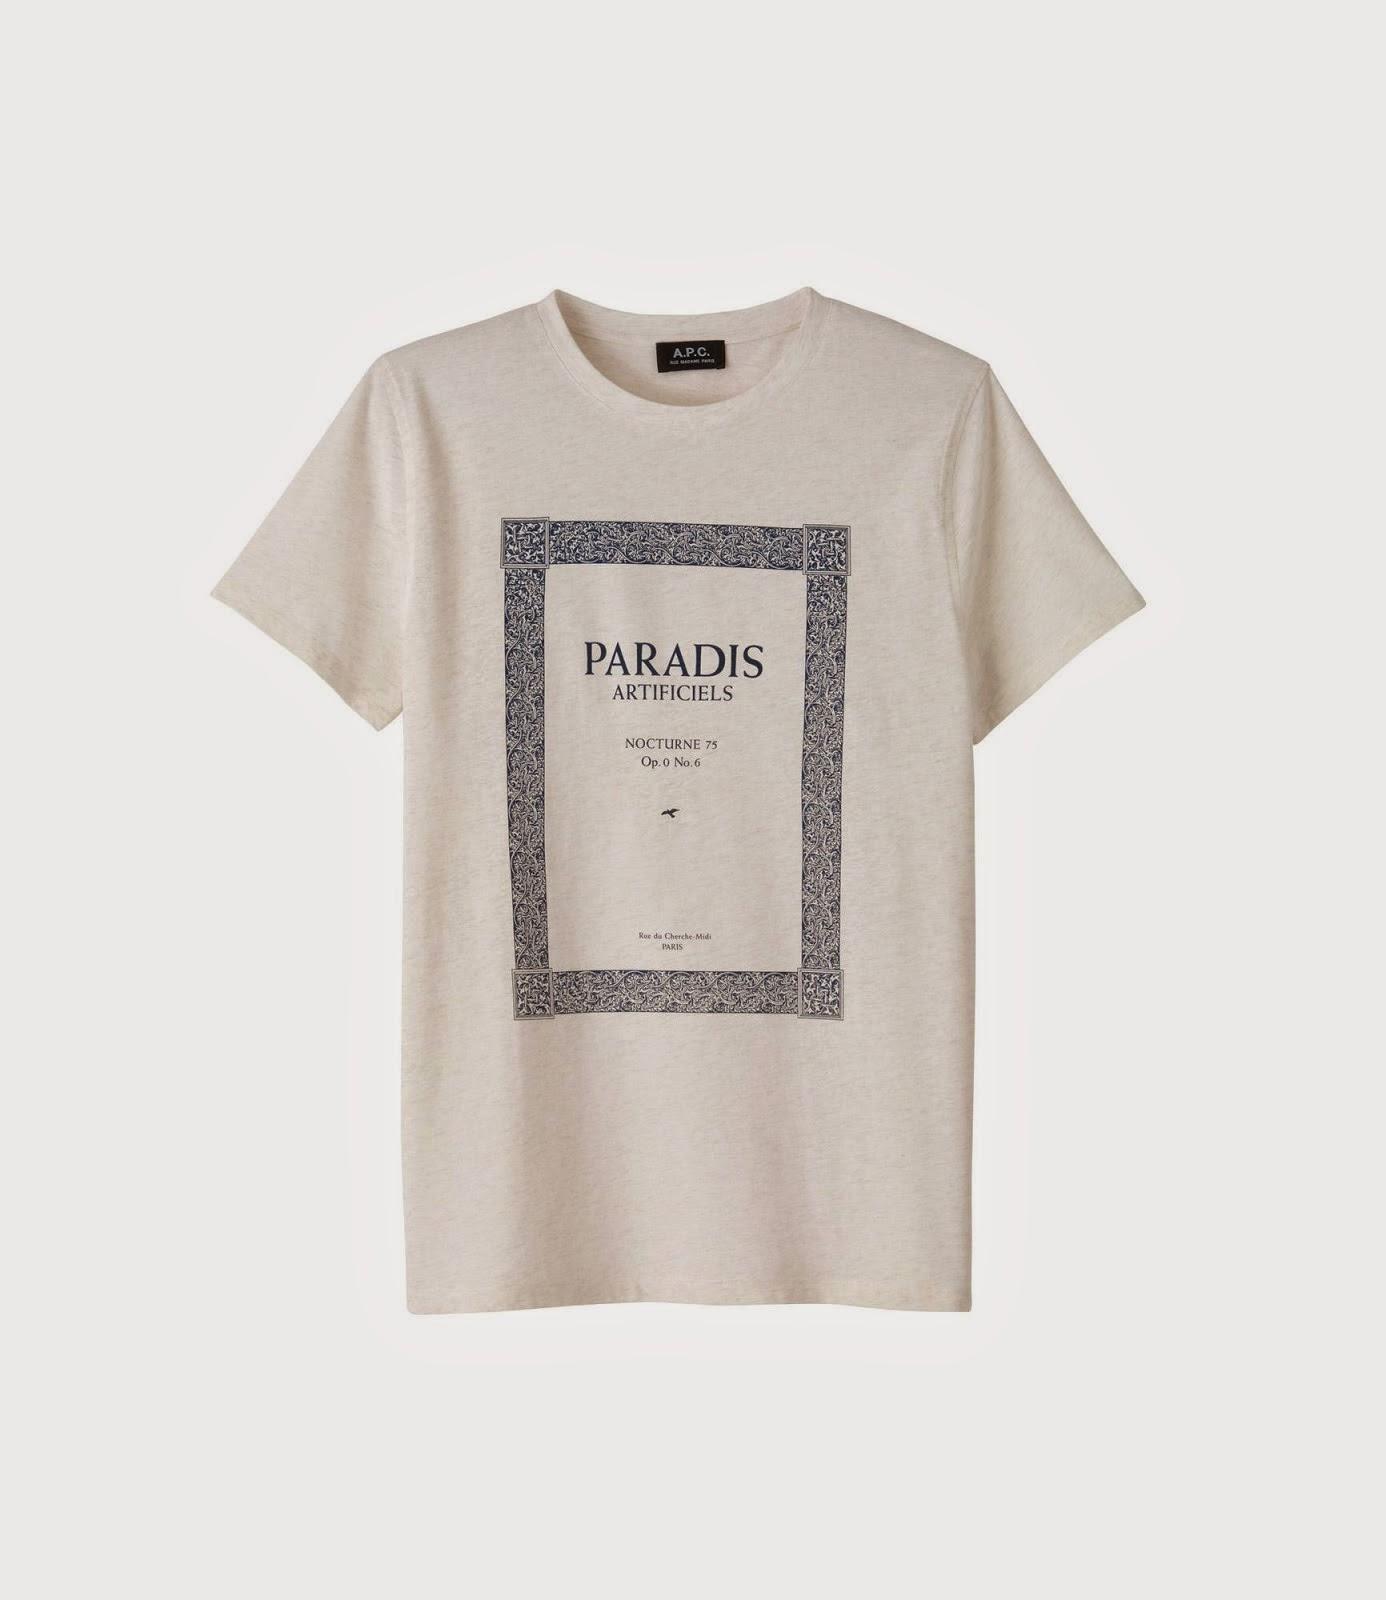 apc tee shirt #1